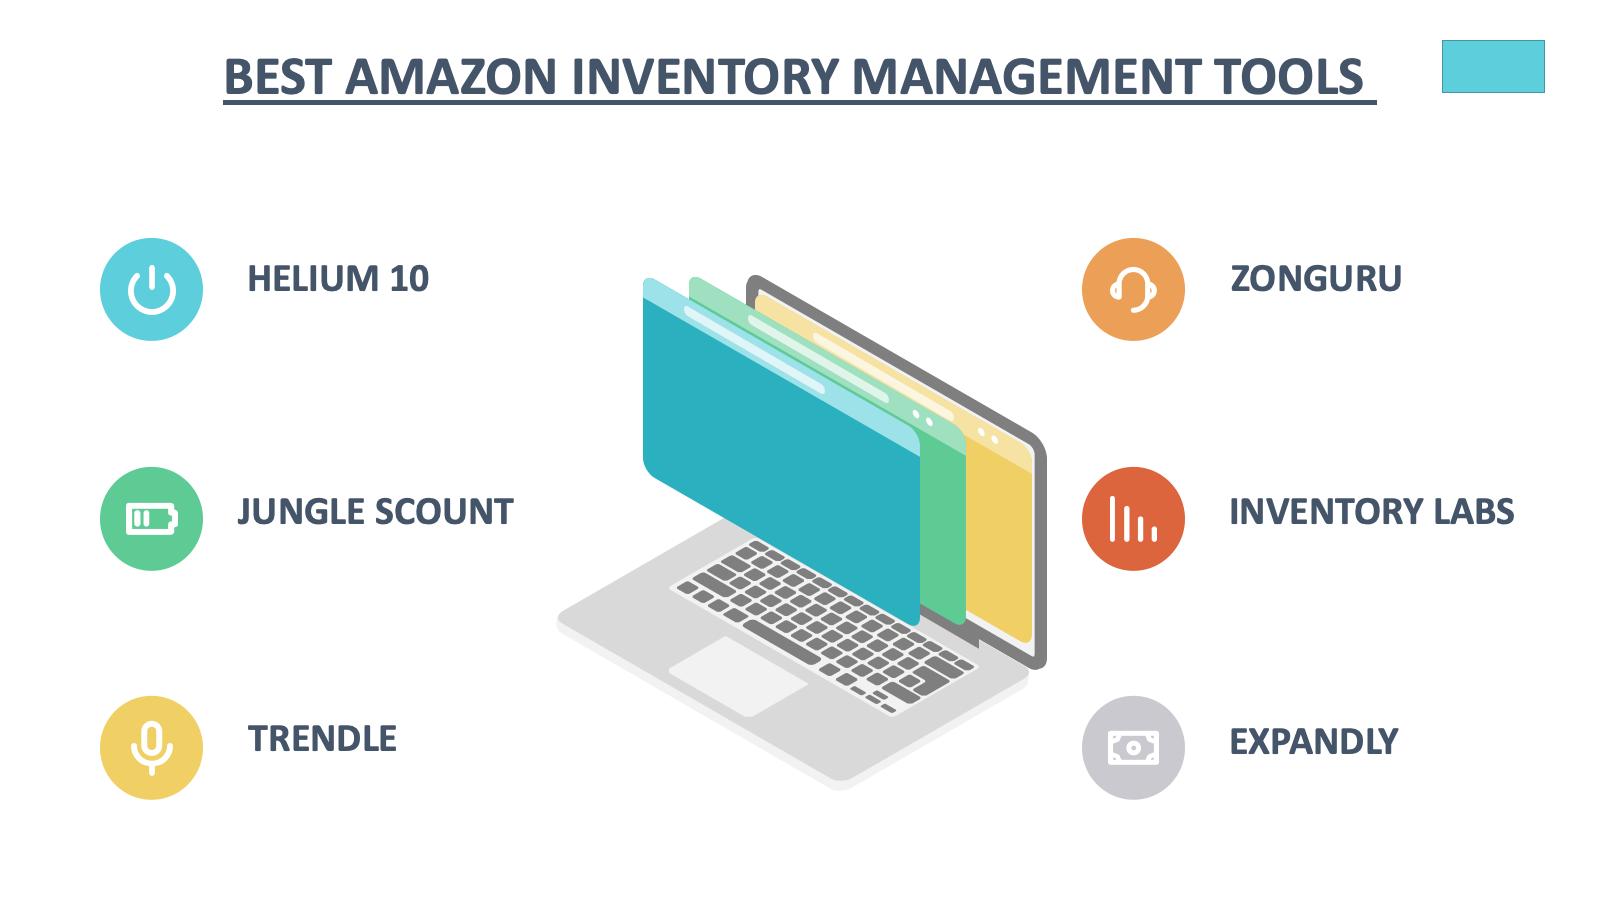 Best Amazon Inventory Management Tools